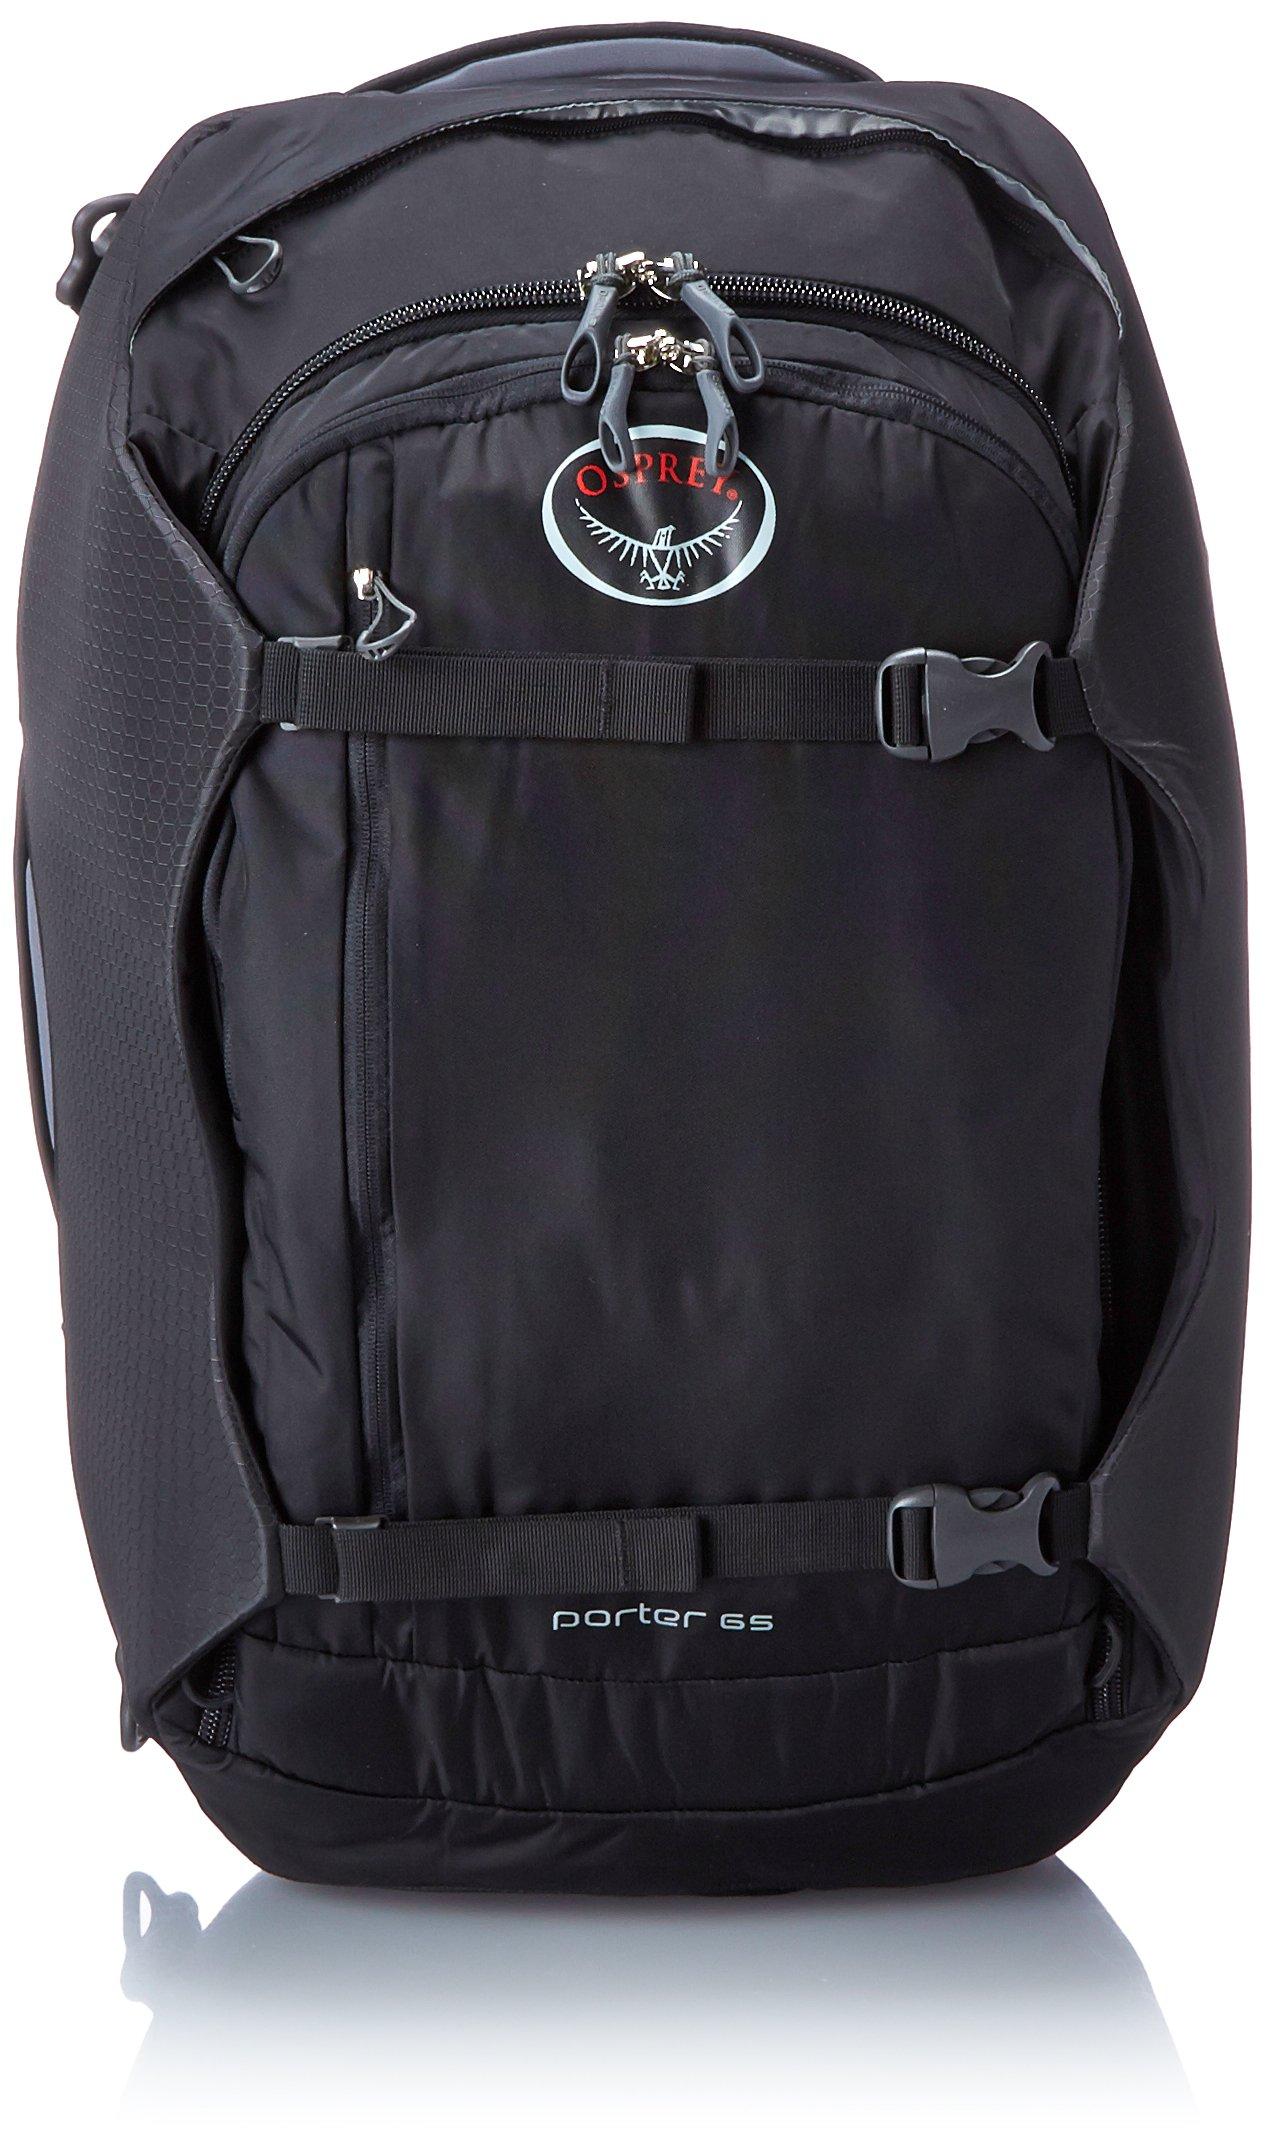 Osprey Porter Travel Duffle Bag, Black, 65-Litre